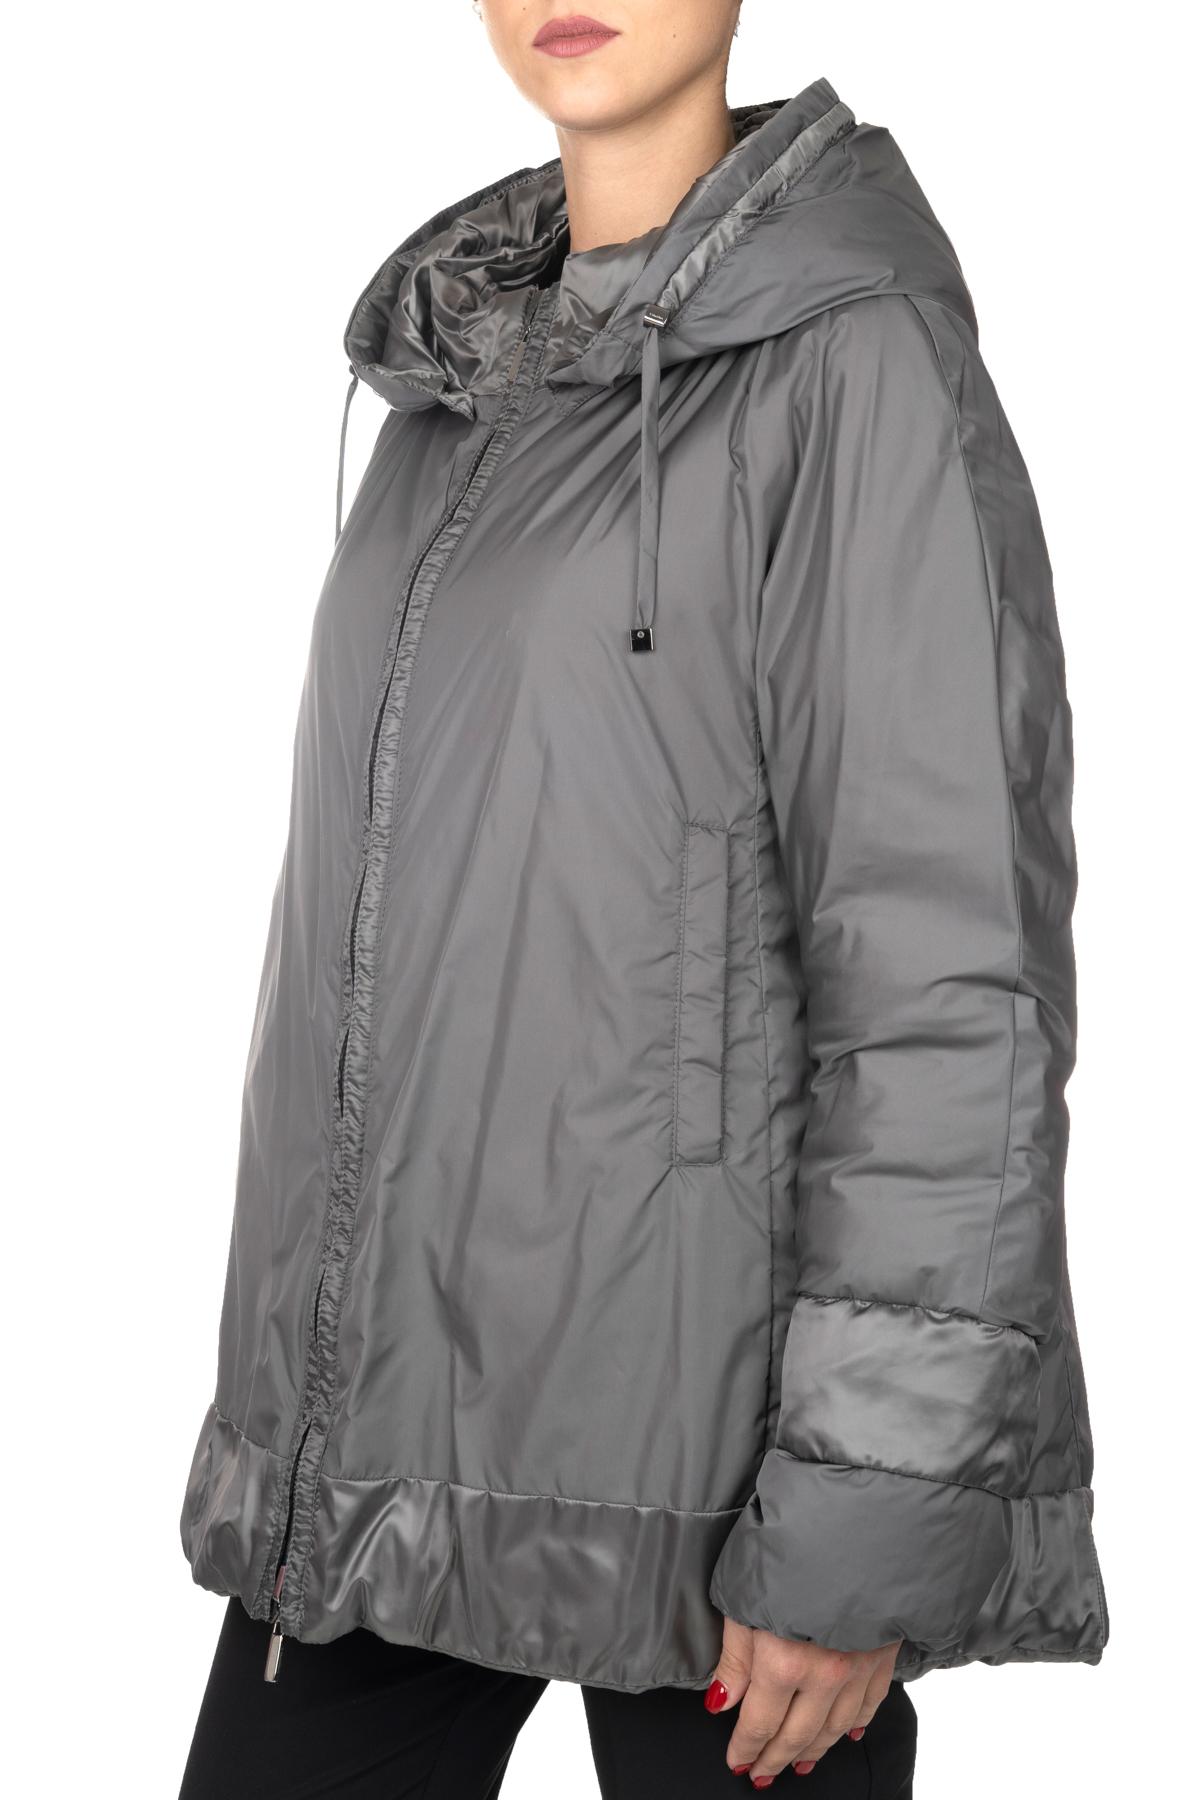 REVERSIBLE GRAY DOWN JACKET IN ANTI-DARK SATIN MAX MARA'S   Jackets   NOVECC9486069660039